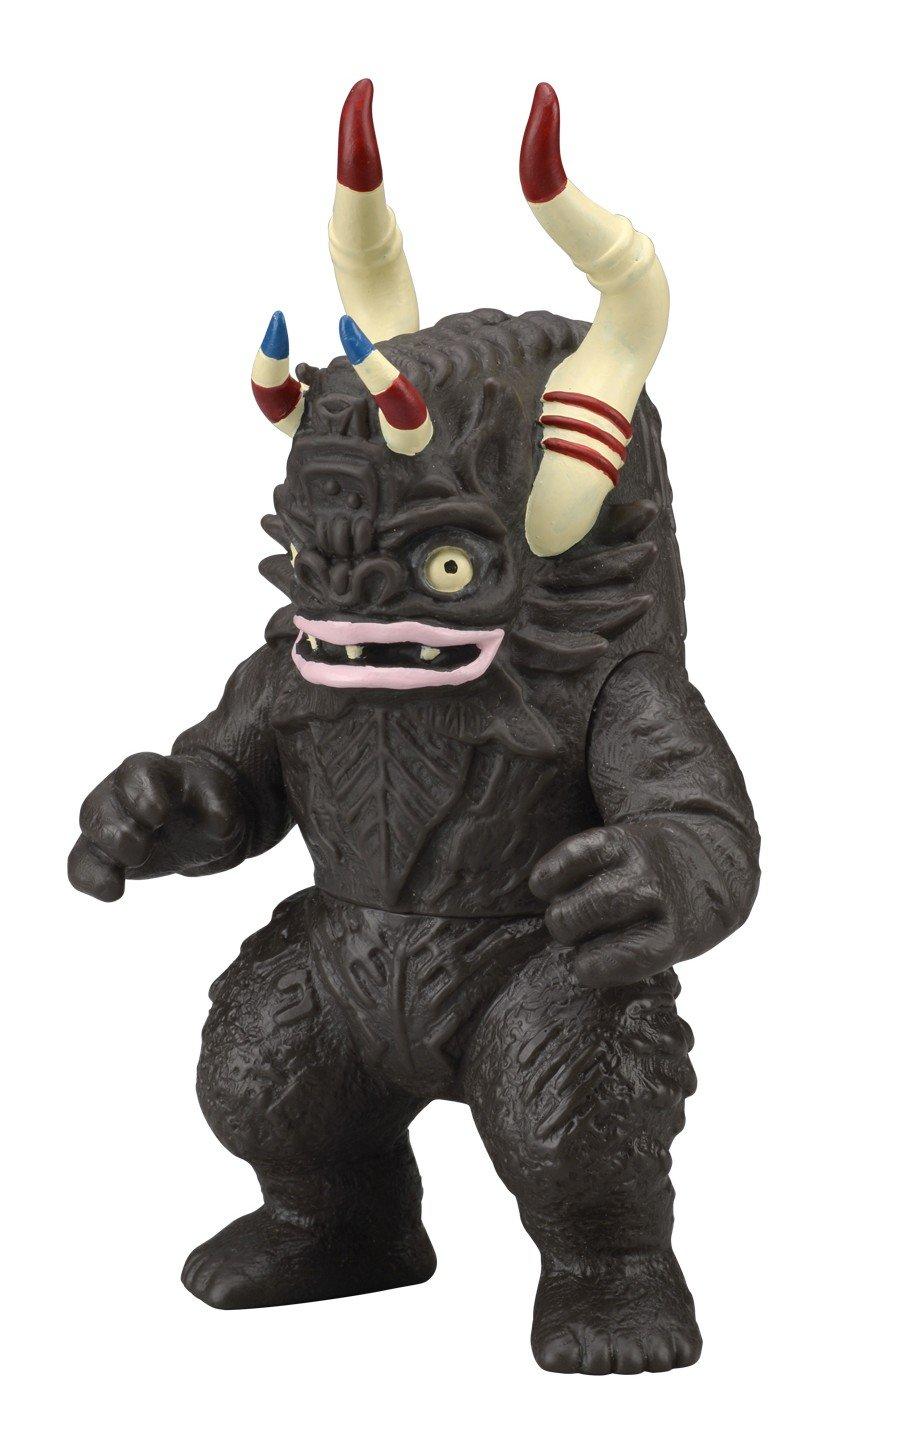 gran descuento 500 Miklas Ultra Monster Monster Monster (japonesas Importaciones)  wholesape barato